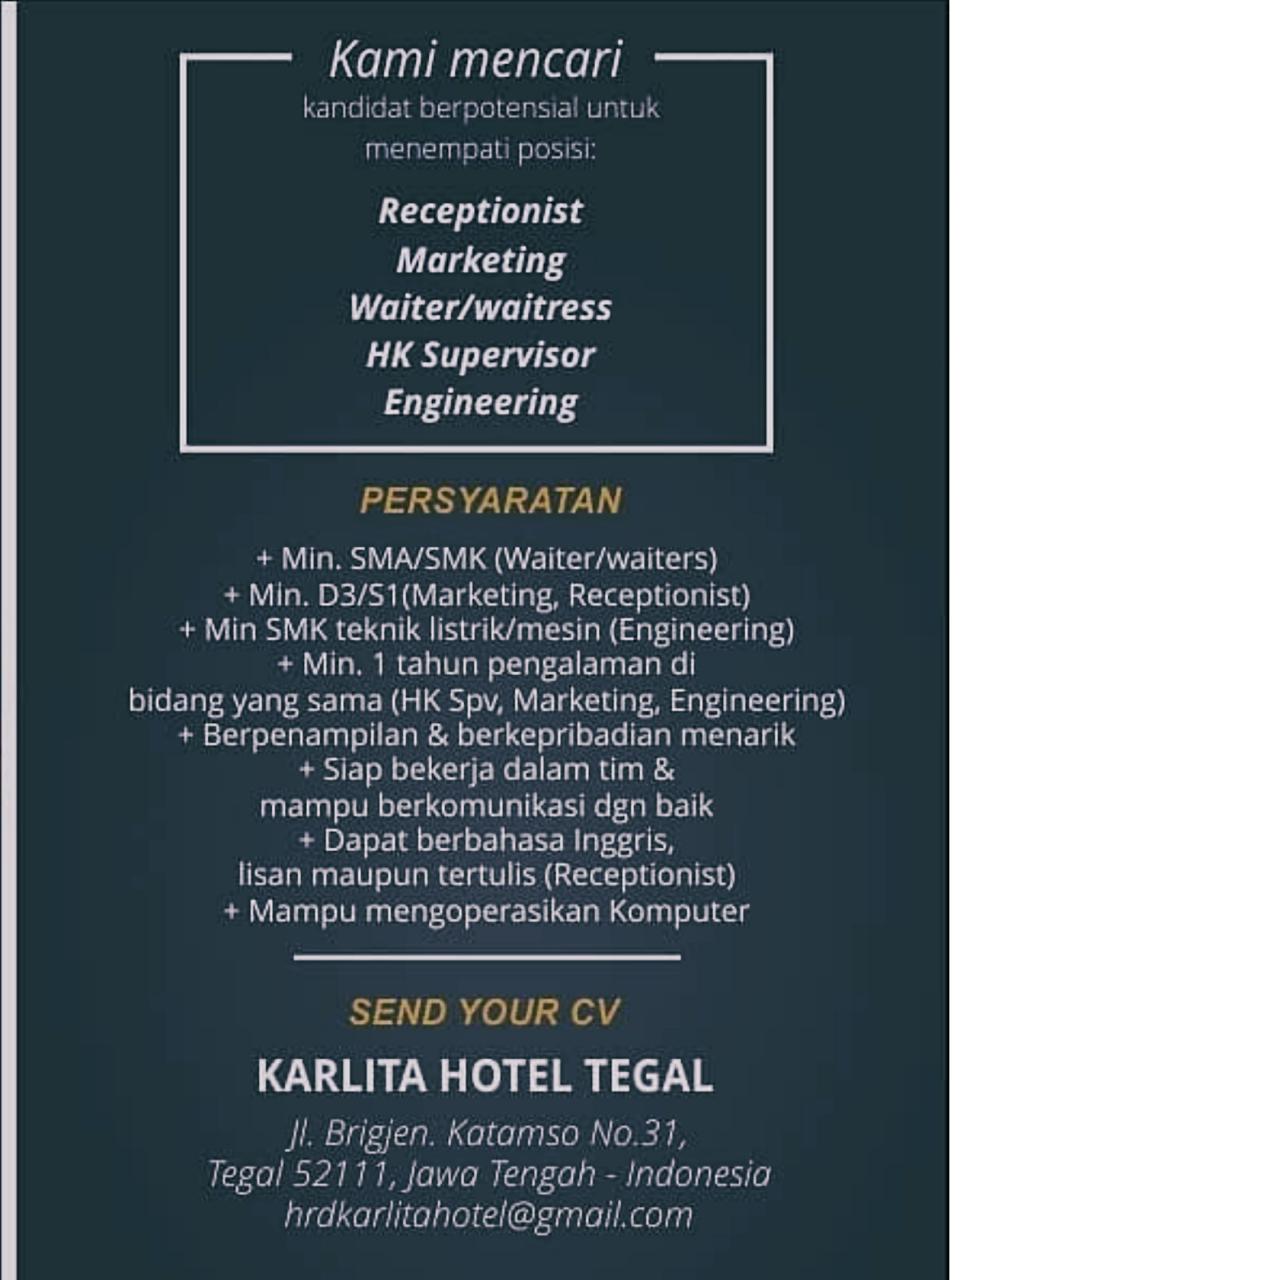 KARLITA HOTEL TEGAL